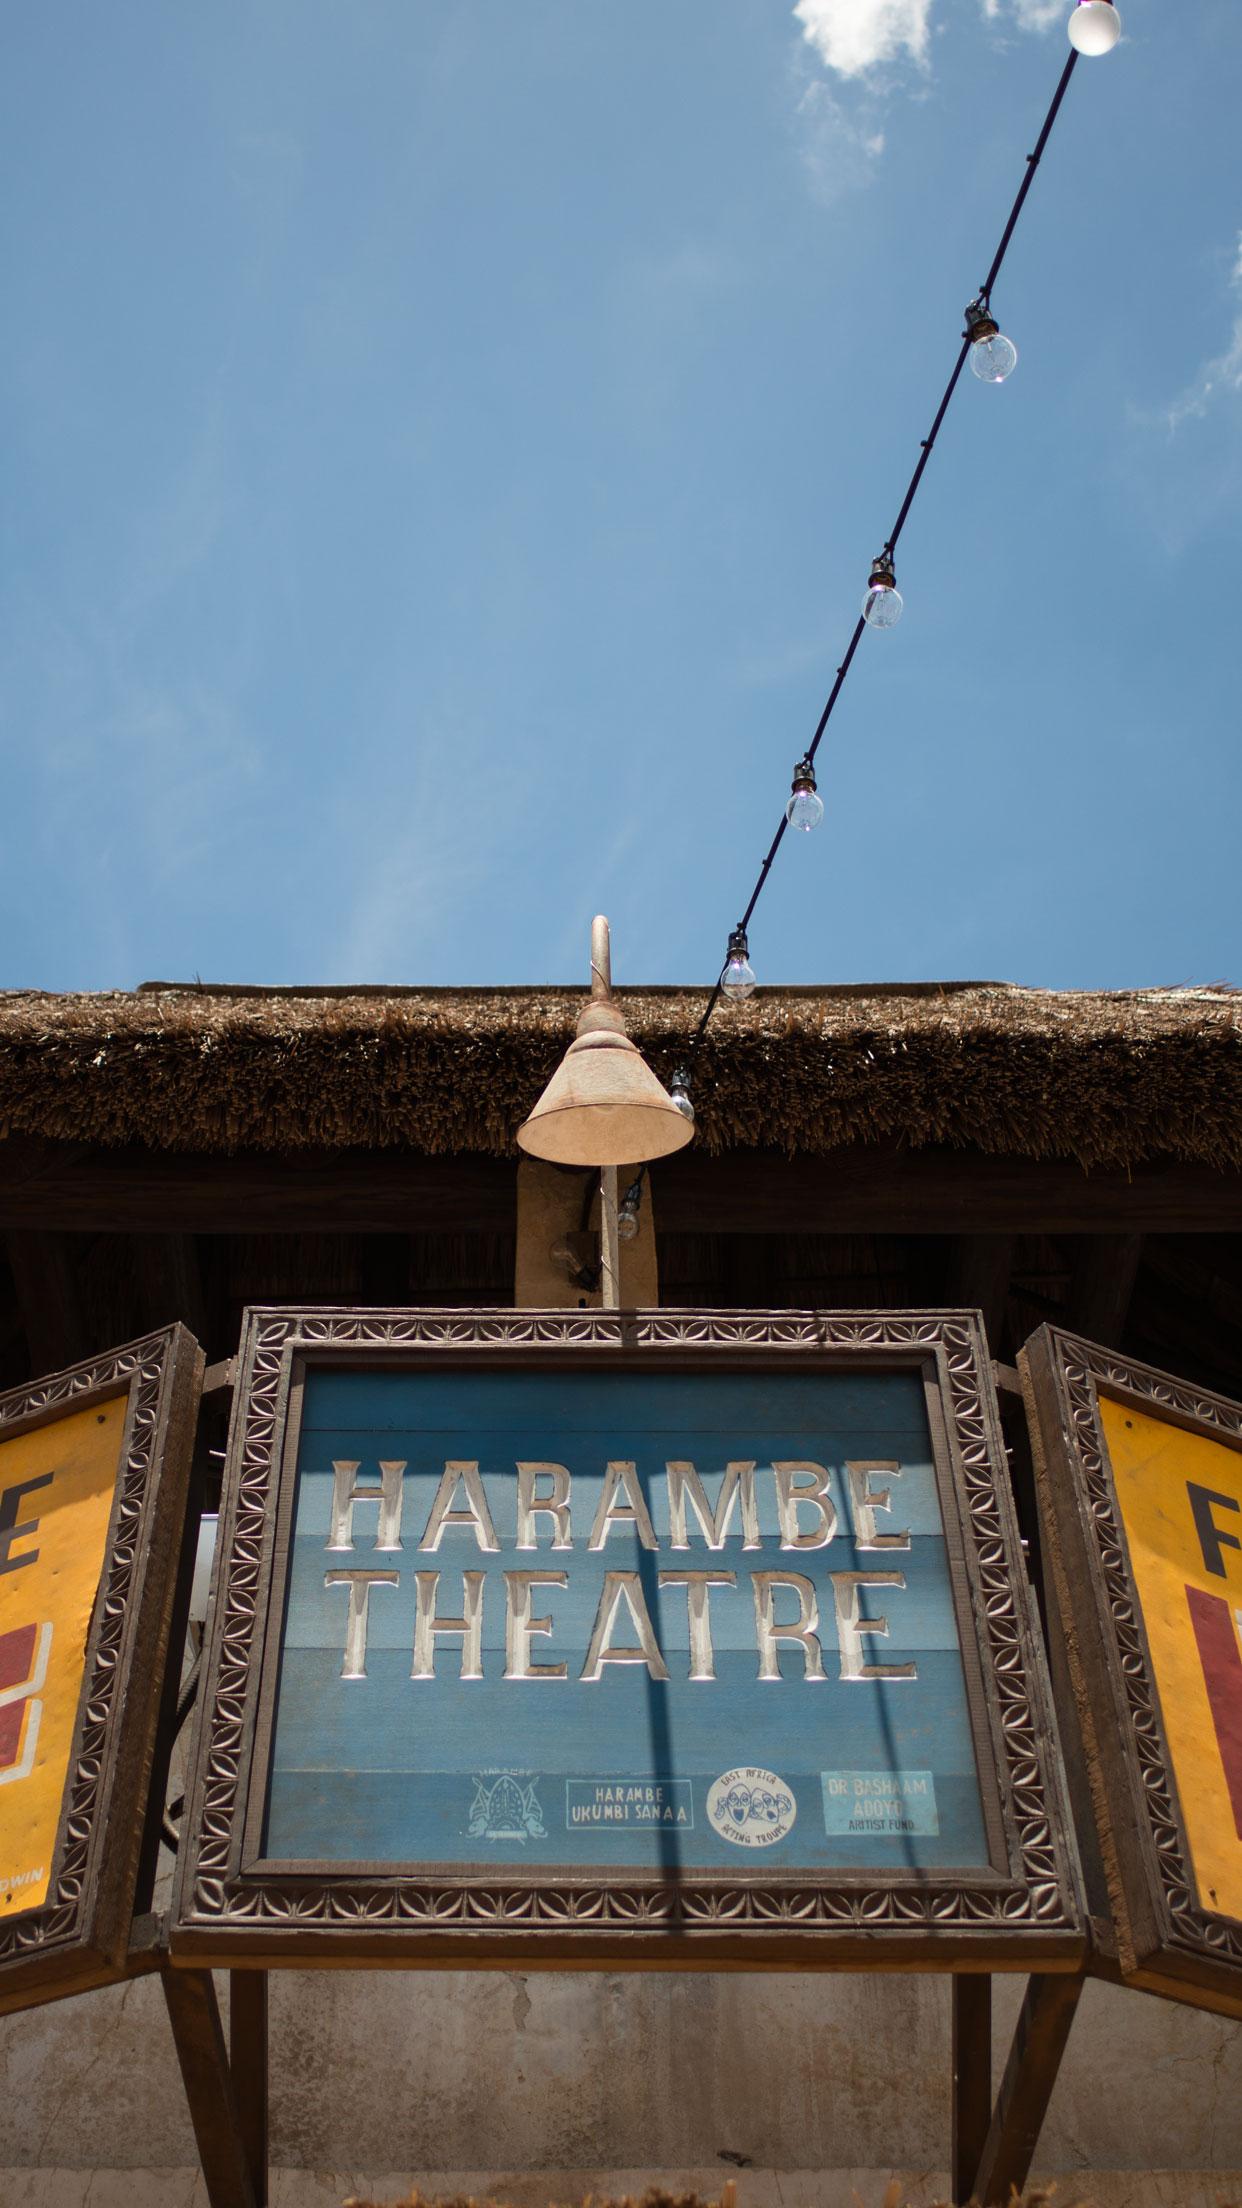 Harambe Theatre